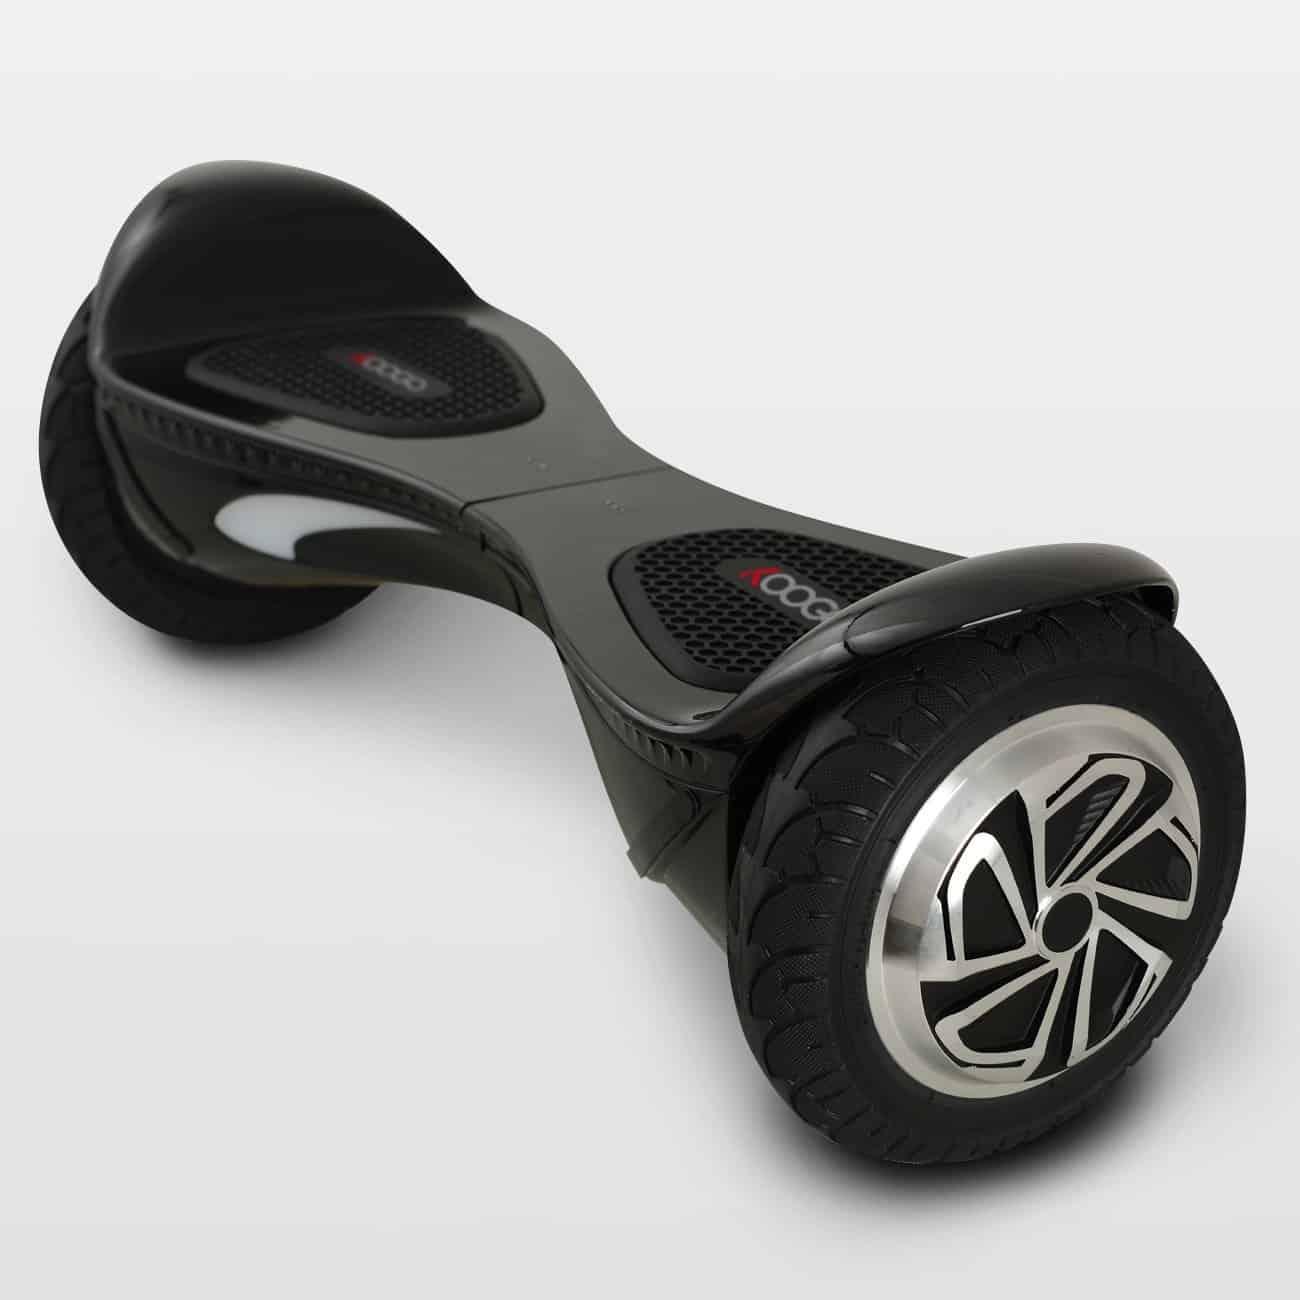 3. Koogo X1 Smart Balancing Electric Skateboard